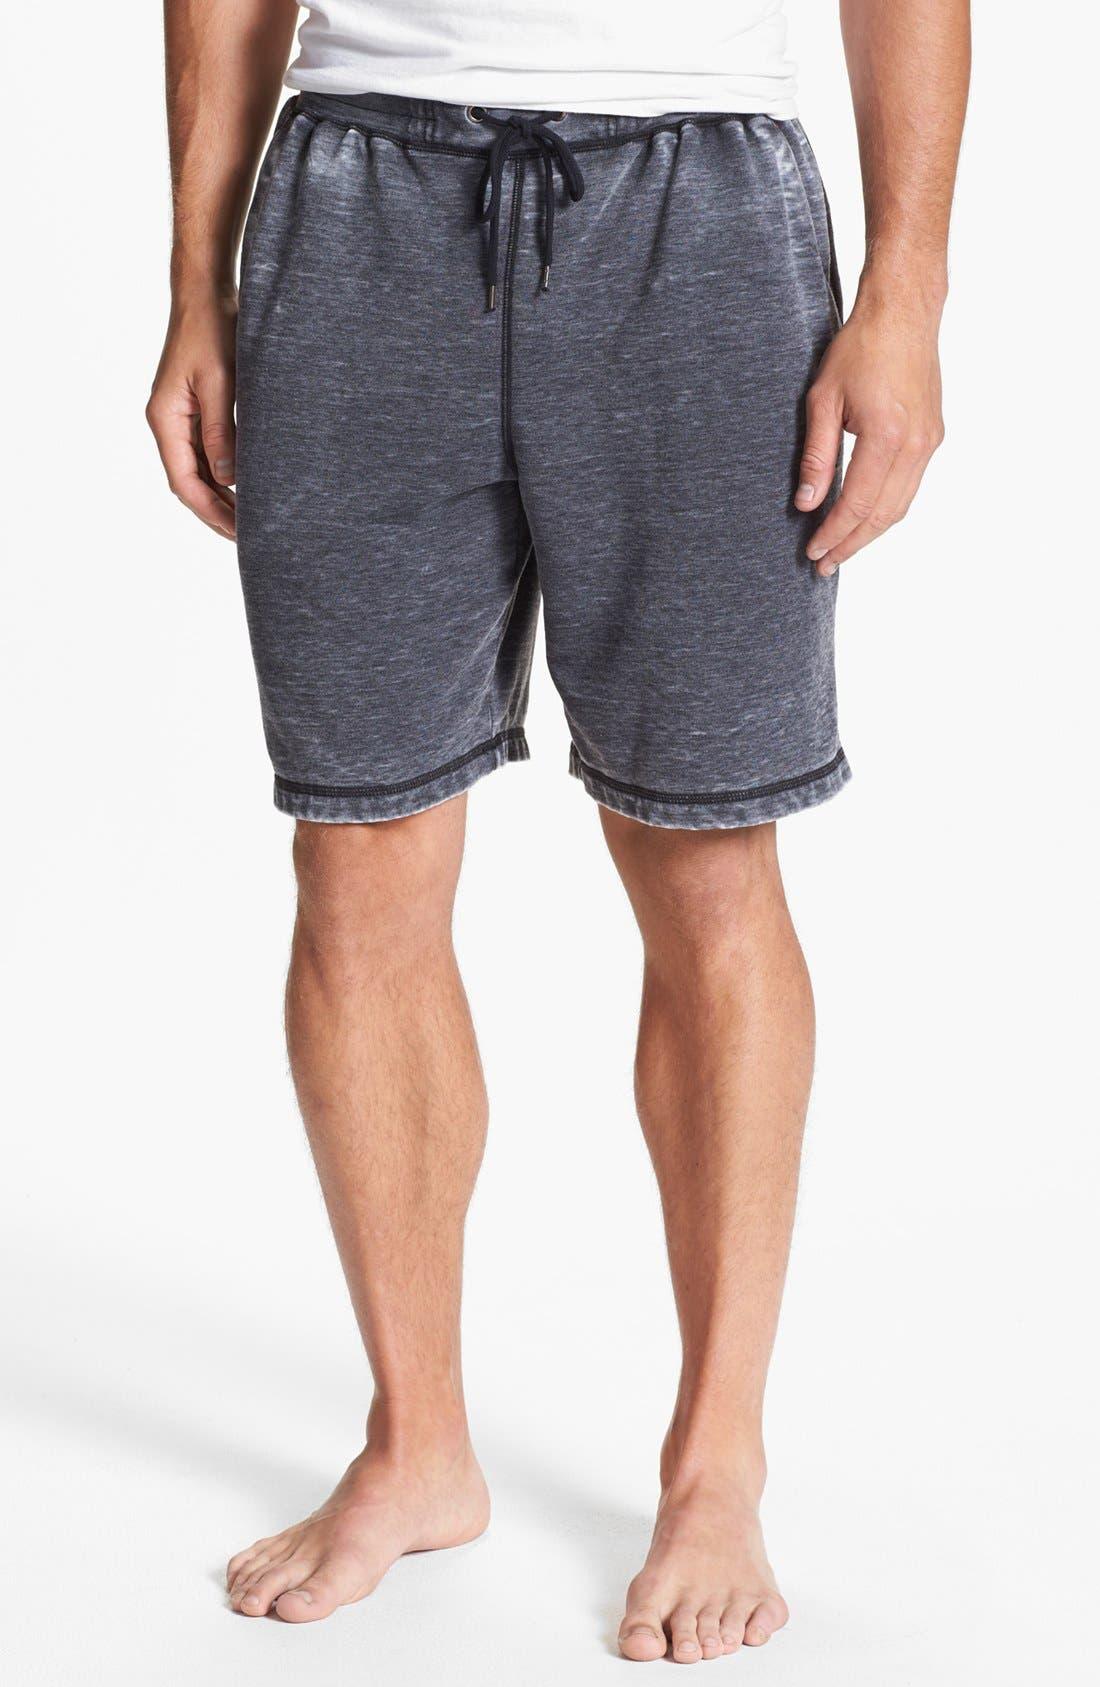 Alternate Image 1 Selected - Daniel Buchler Washed Cotton Blend Shorts